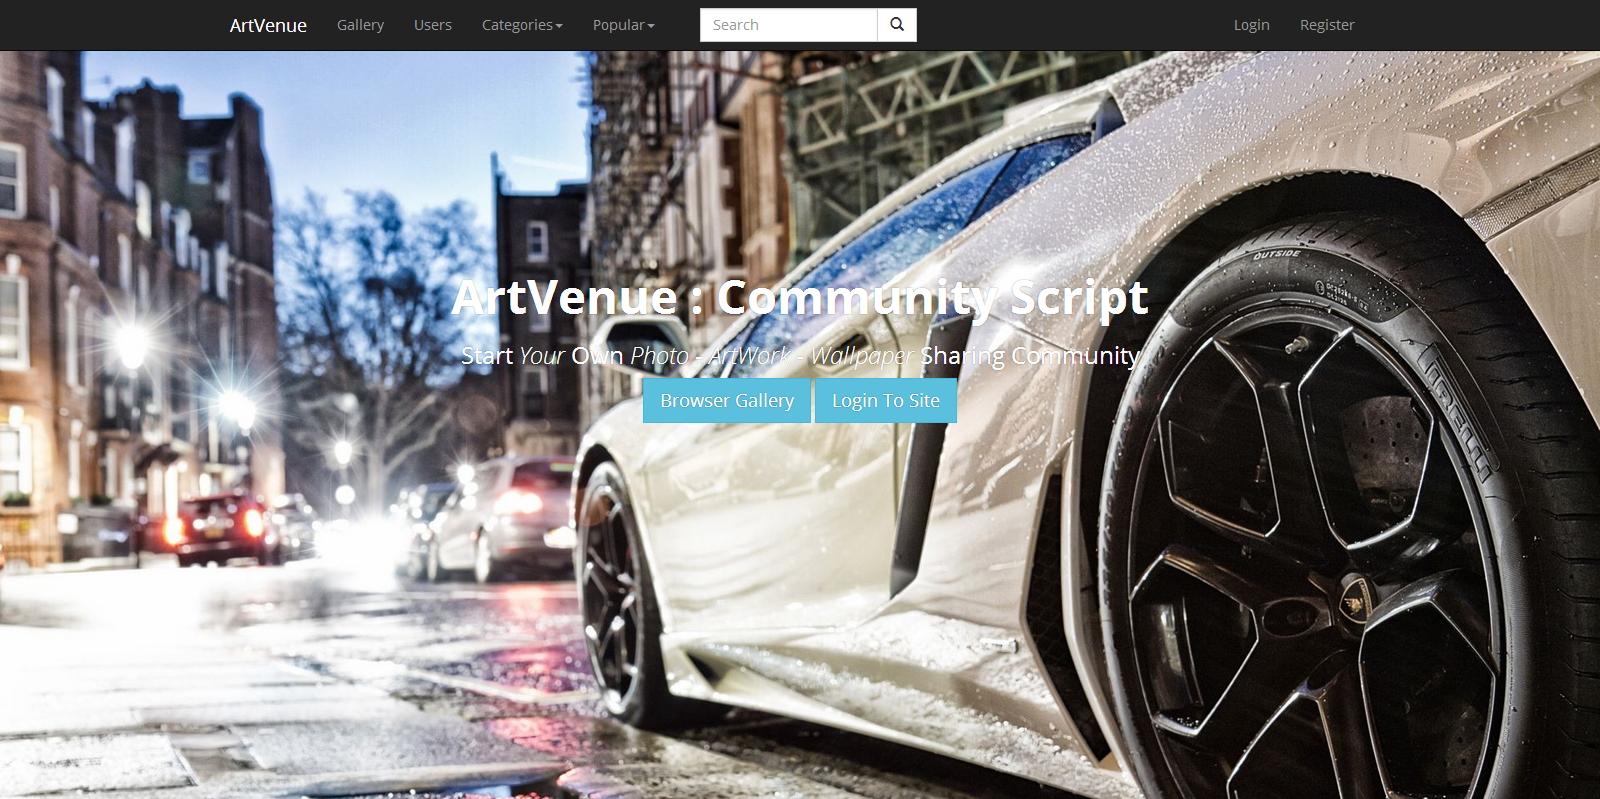 ArtVenue : Image Sharing Community Script